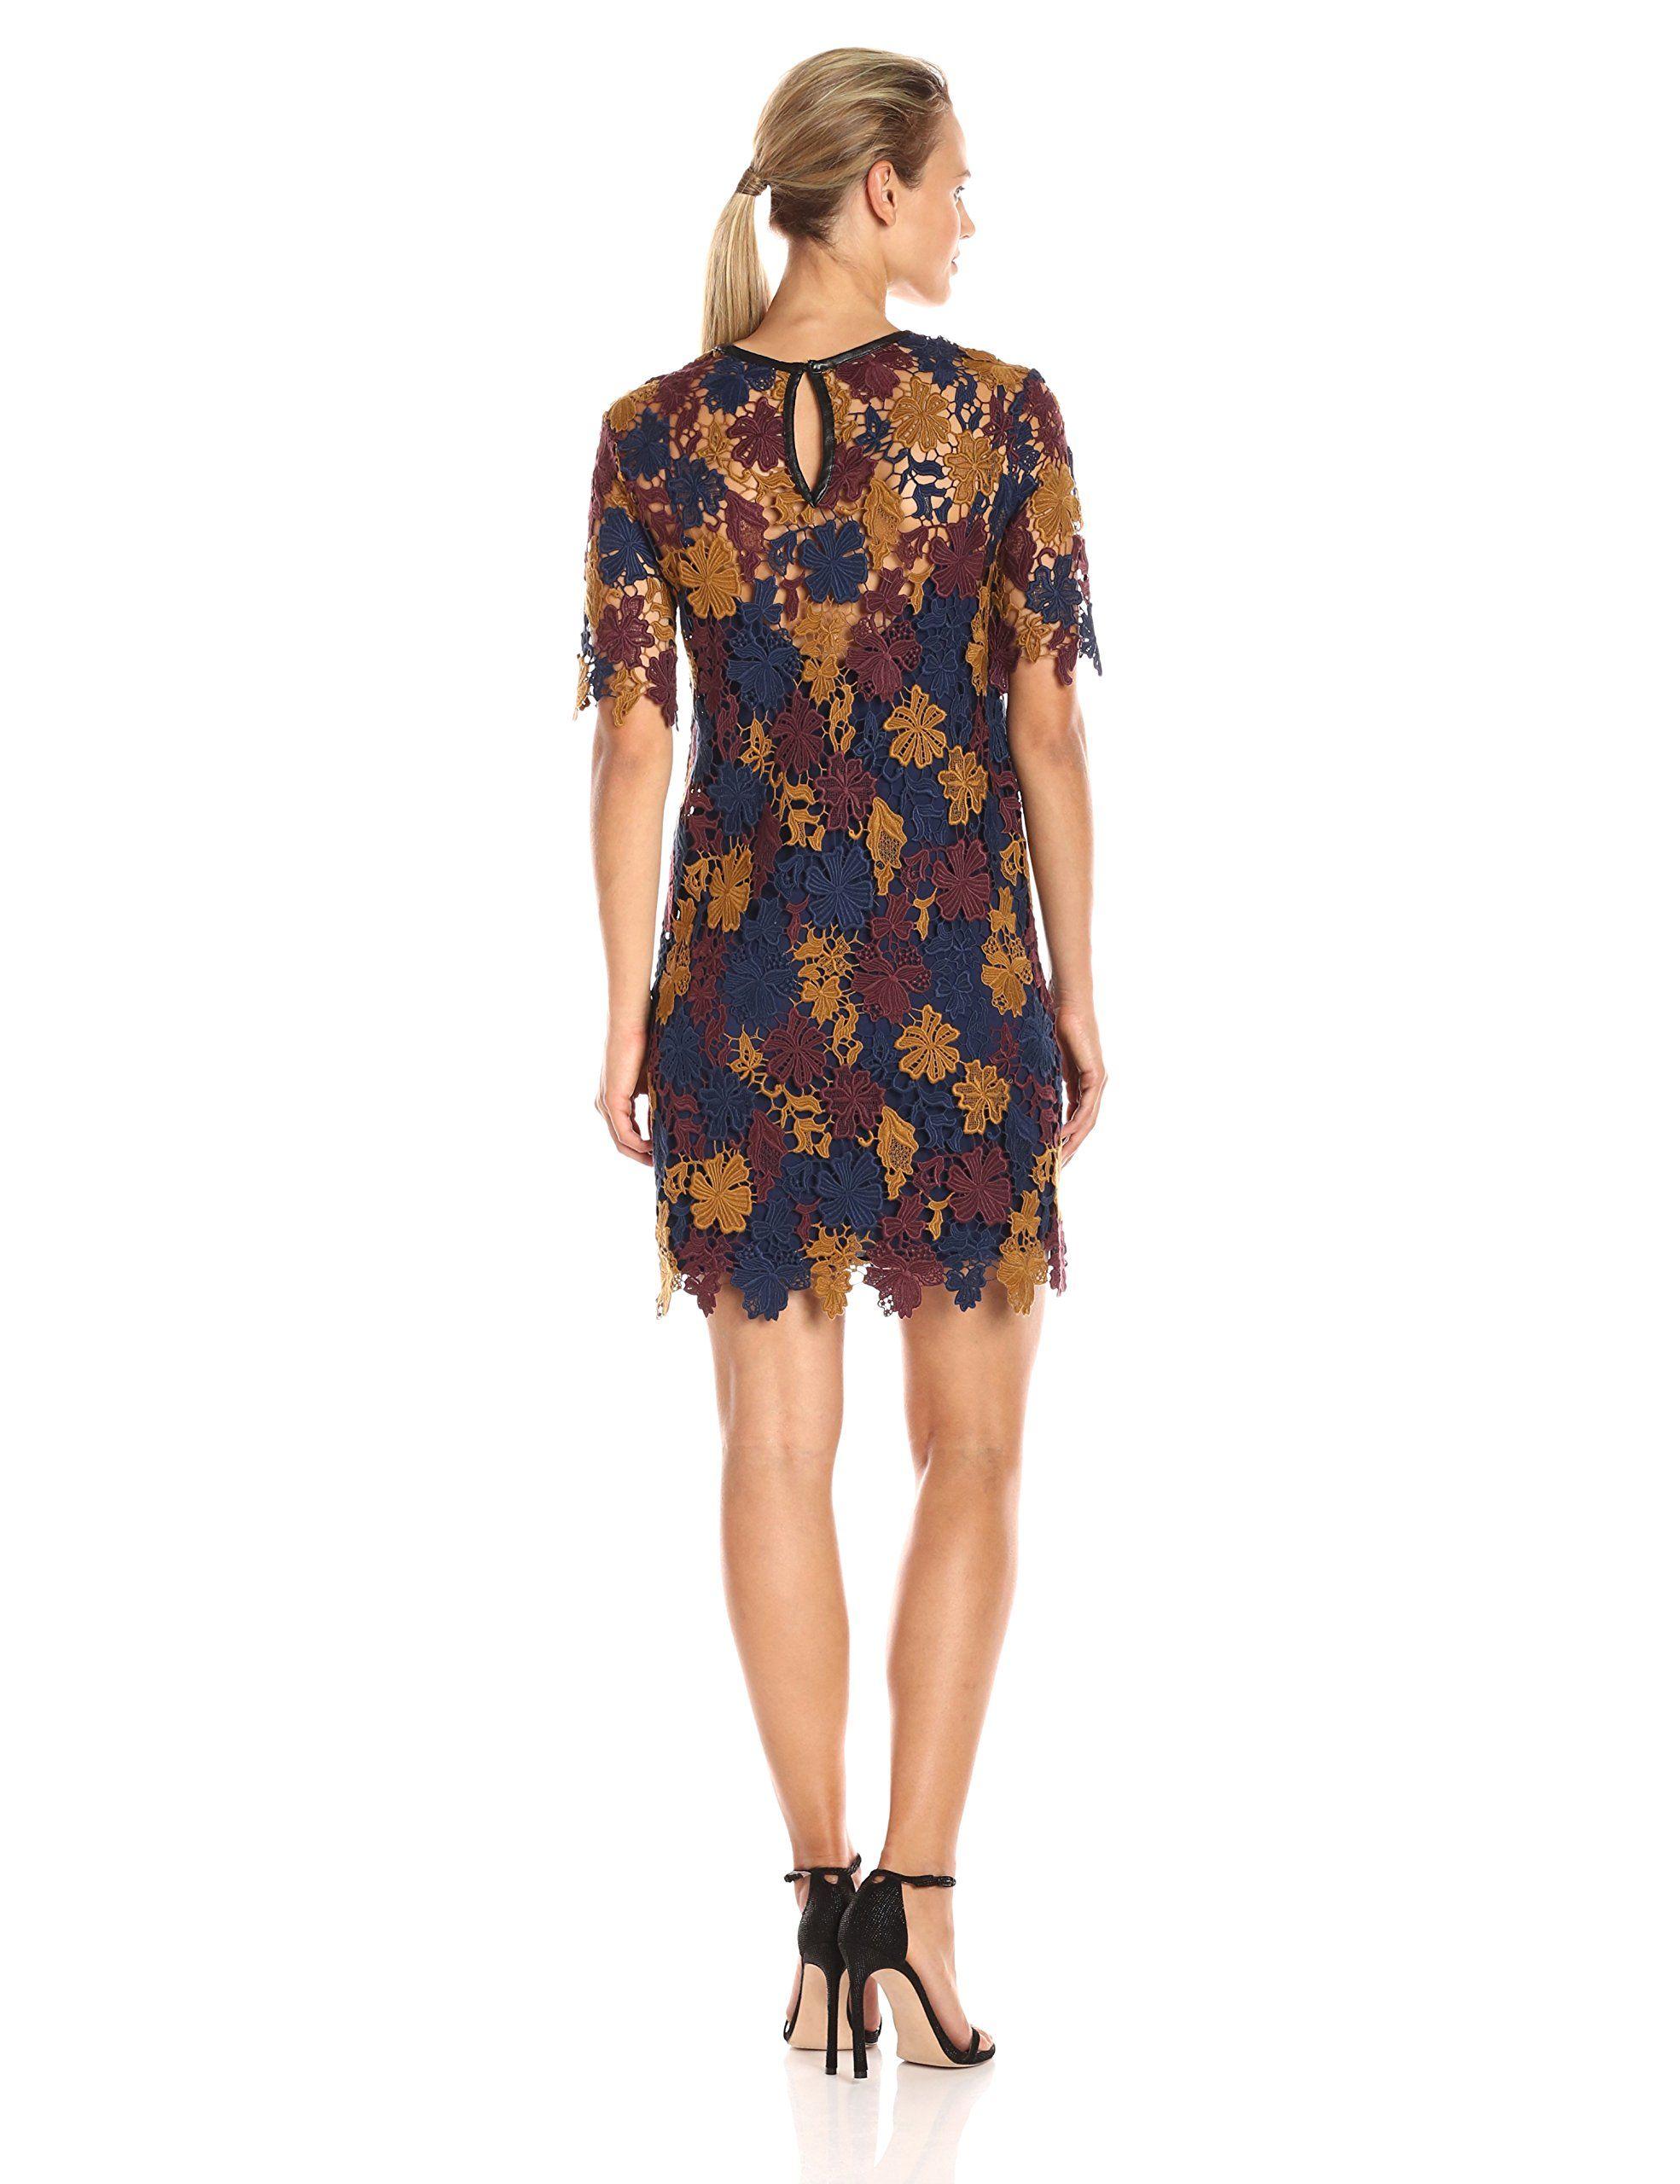 Lace dress navy  ASTR the label Womens Charlotte Lace Dress NavyWine Multi Medium